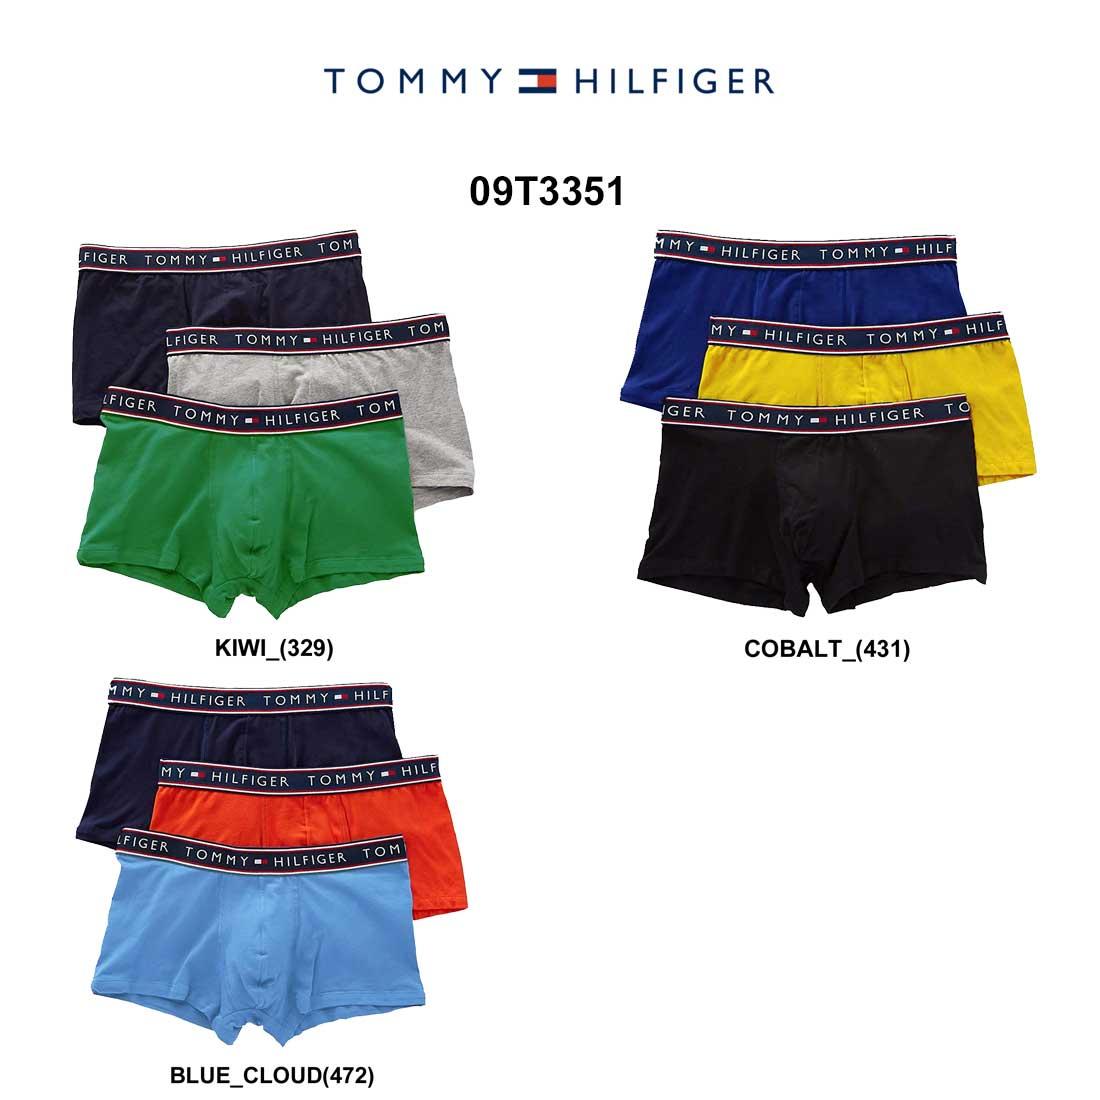 (SALE)TOMMY HILFIGER(トミーヒルフィガー)ショート ボクサーパンツ 3枚セット メンズ 下着 2019春夏 09T3351